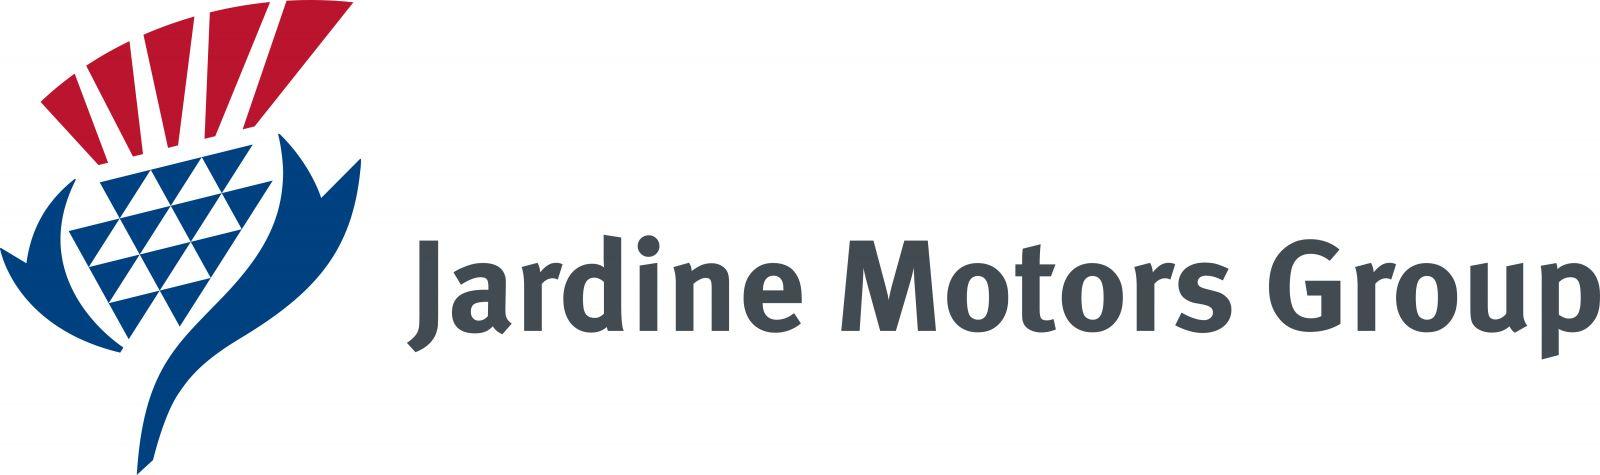 Jardine Motor logo